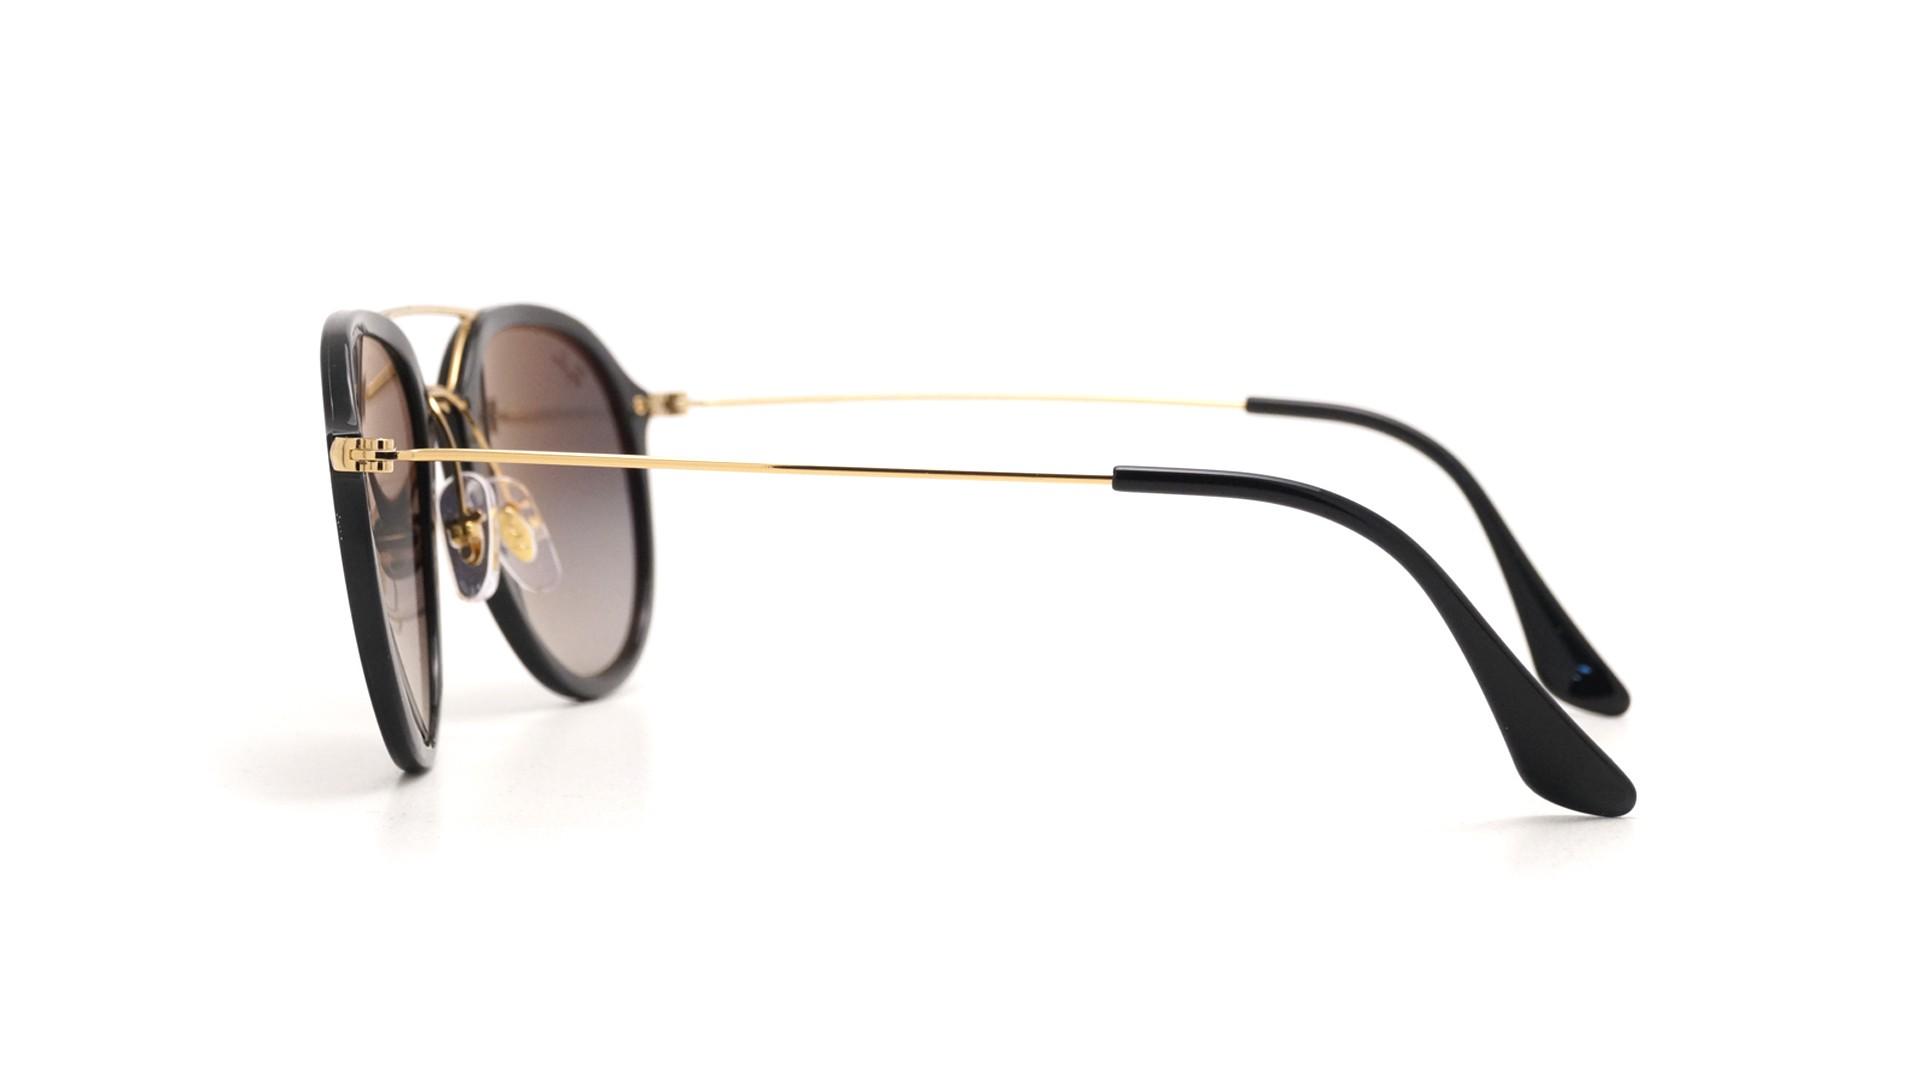 e7846e3e75e1c0 Sonnenbrillen Ray-Ban Schwarz RB4253 601 71 53-21 Mittel Gradient Gläser